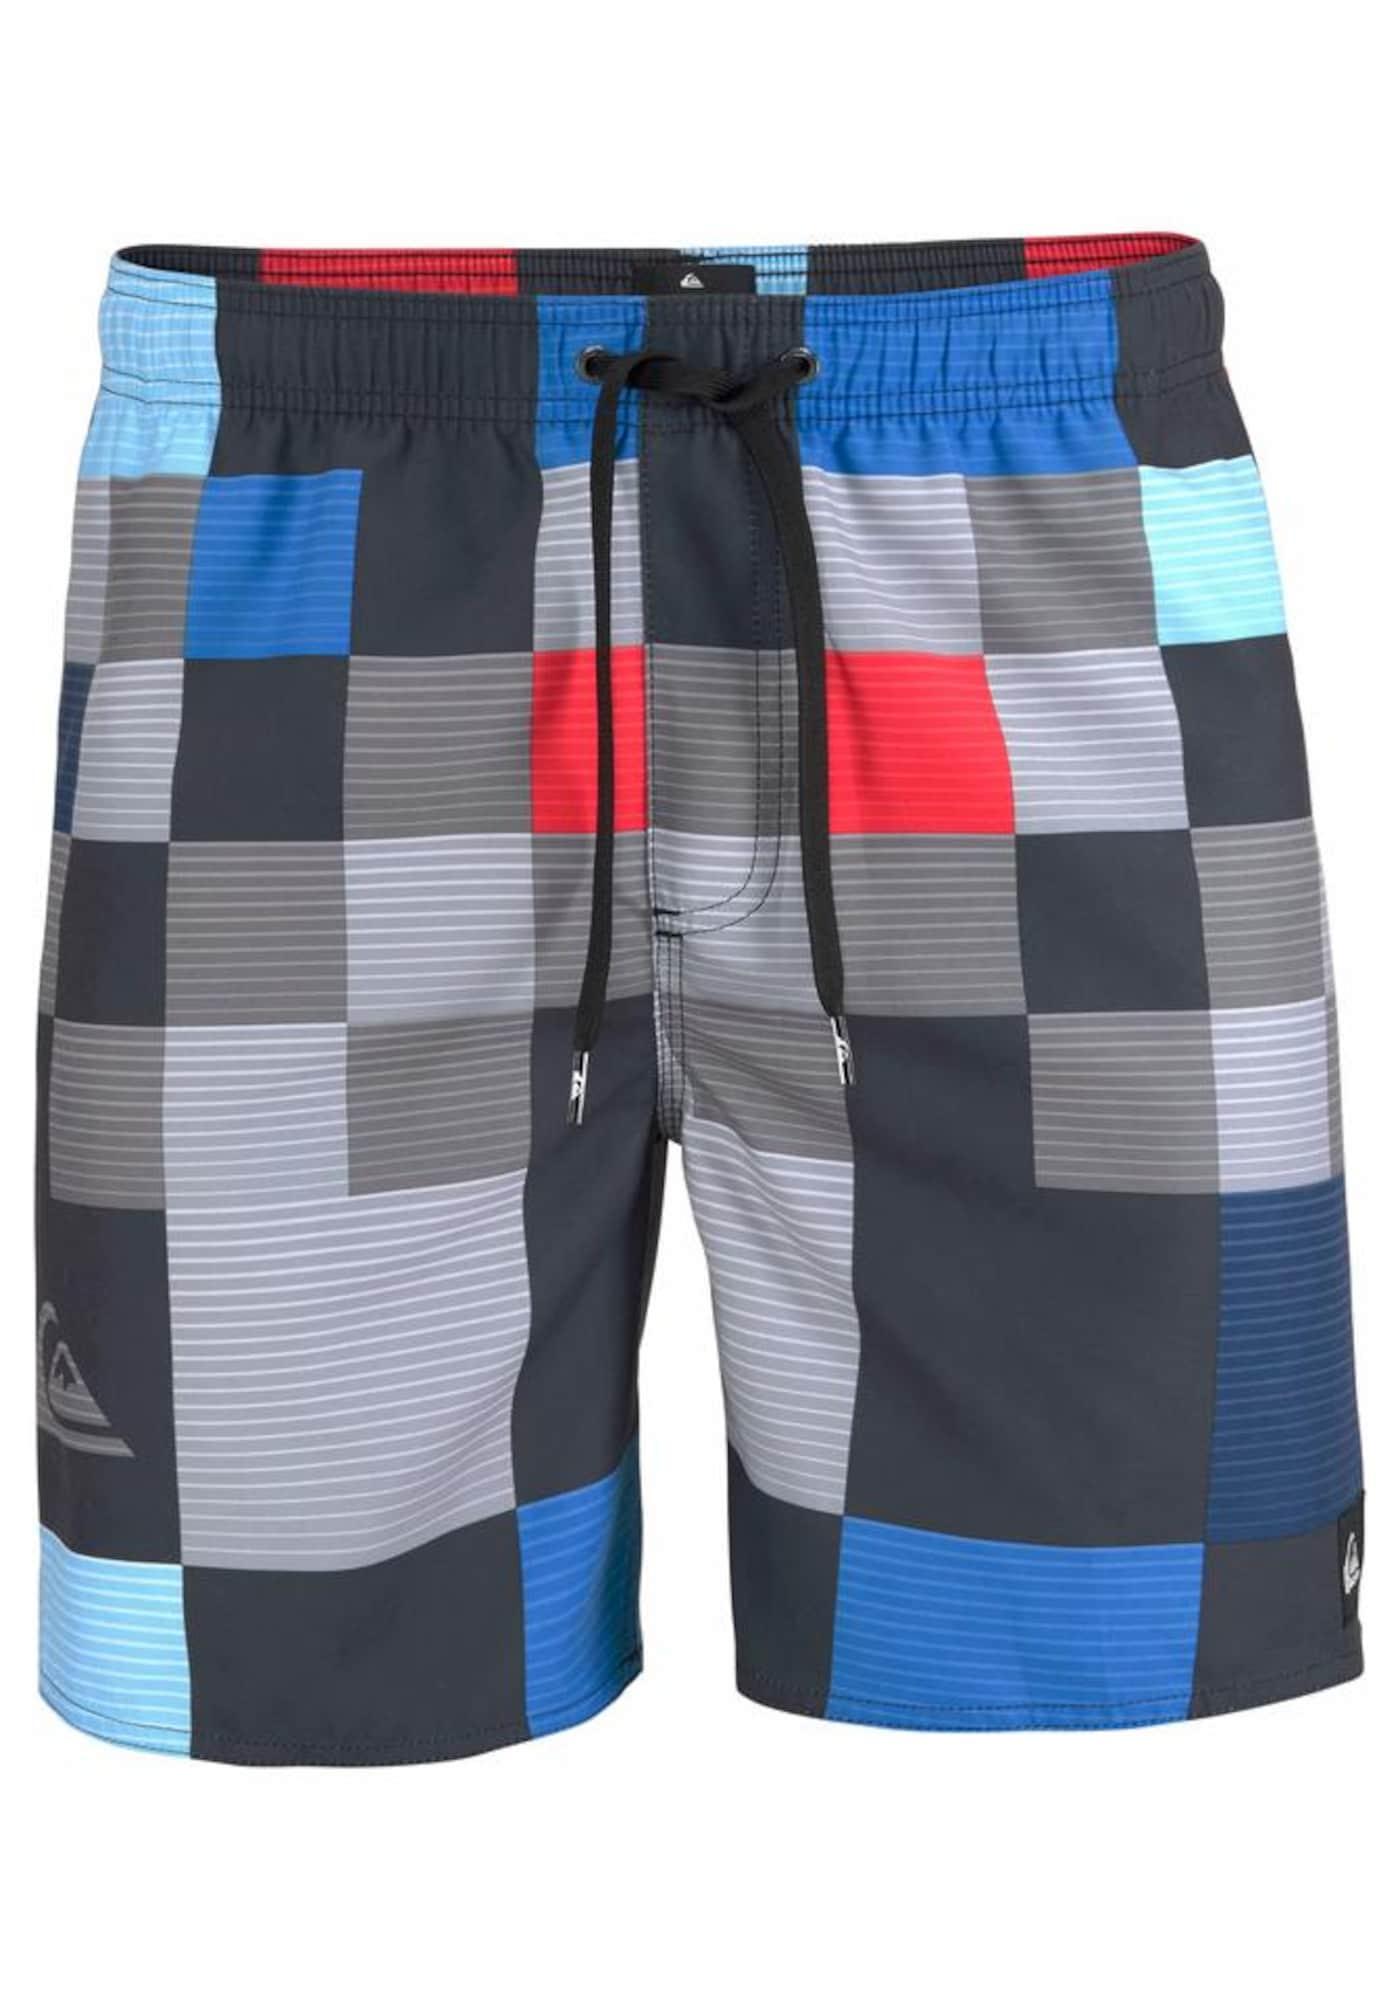 Boardshorts 'CHECKERS CHECKER'   Bekleidung > Bademode > Boardshorts   Mehrfarbig   Quiksilver